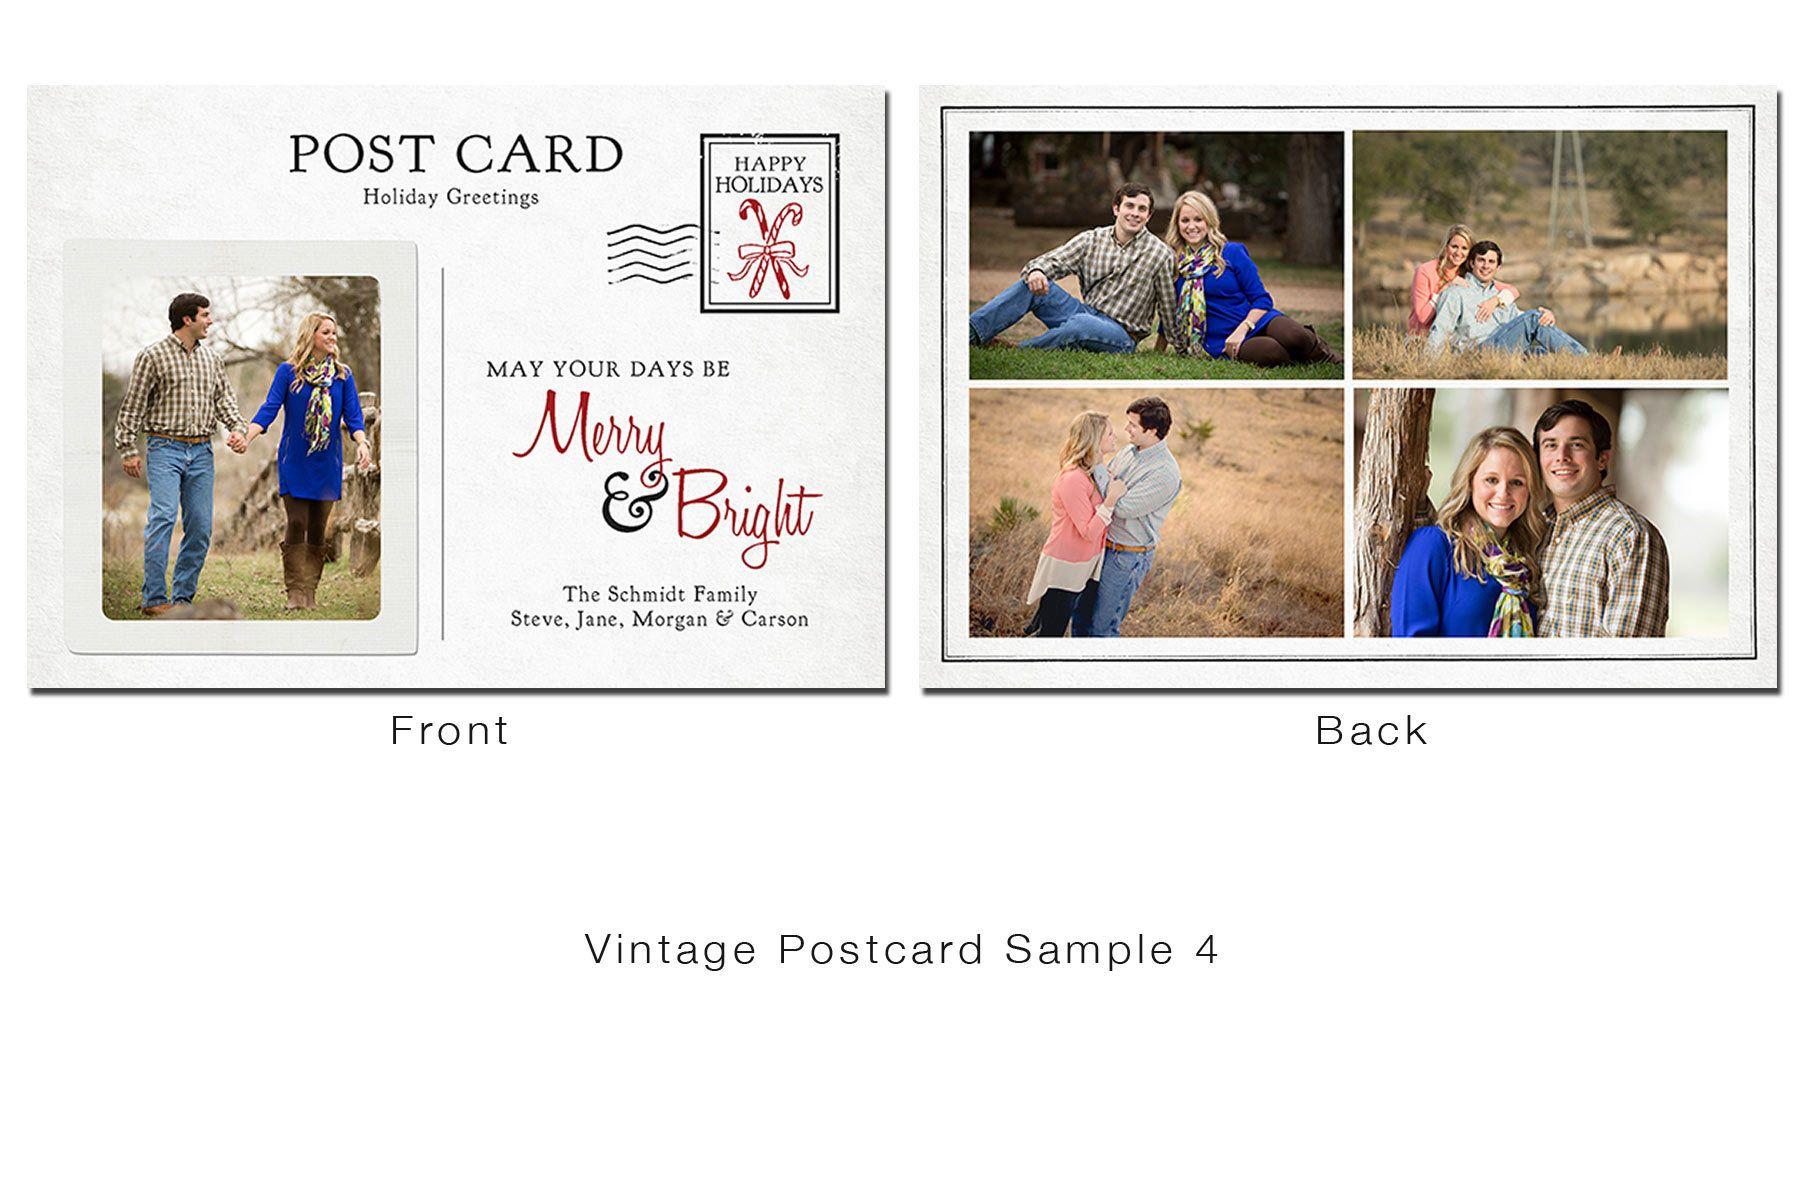 1vintage_postcard_sample_4.jpg